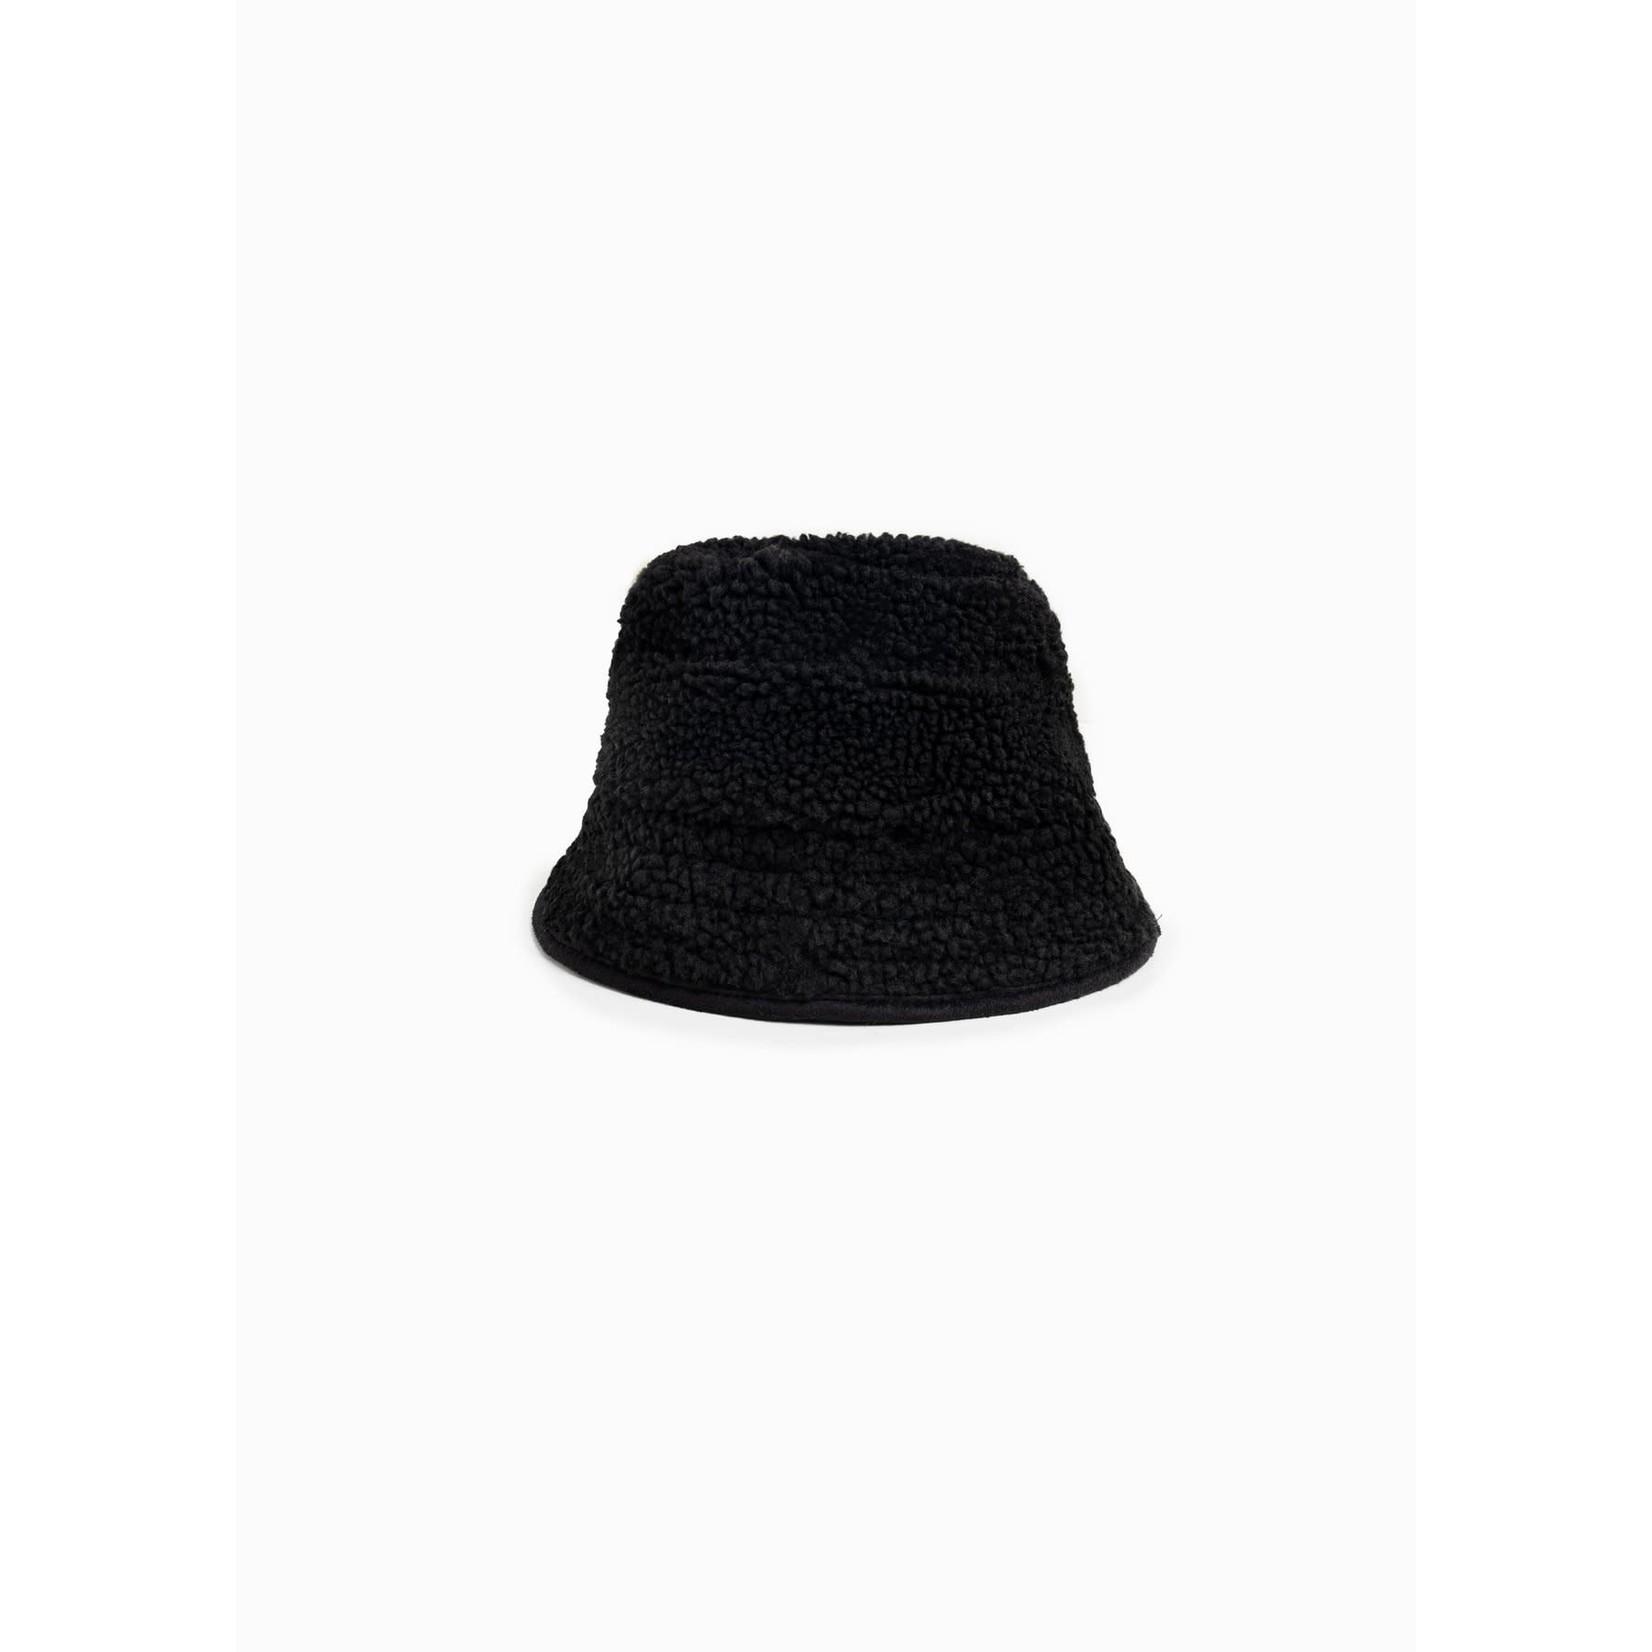 Shearling Basic Bucket Hat in Black